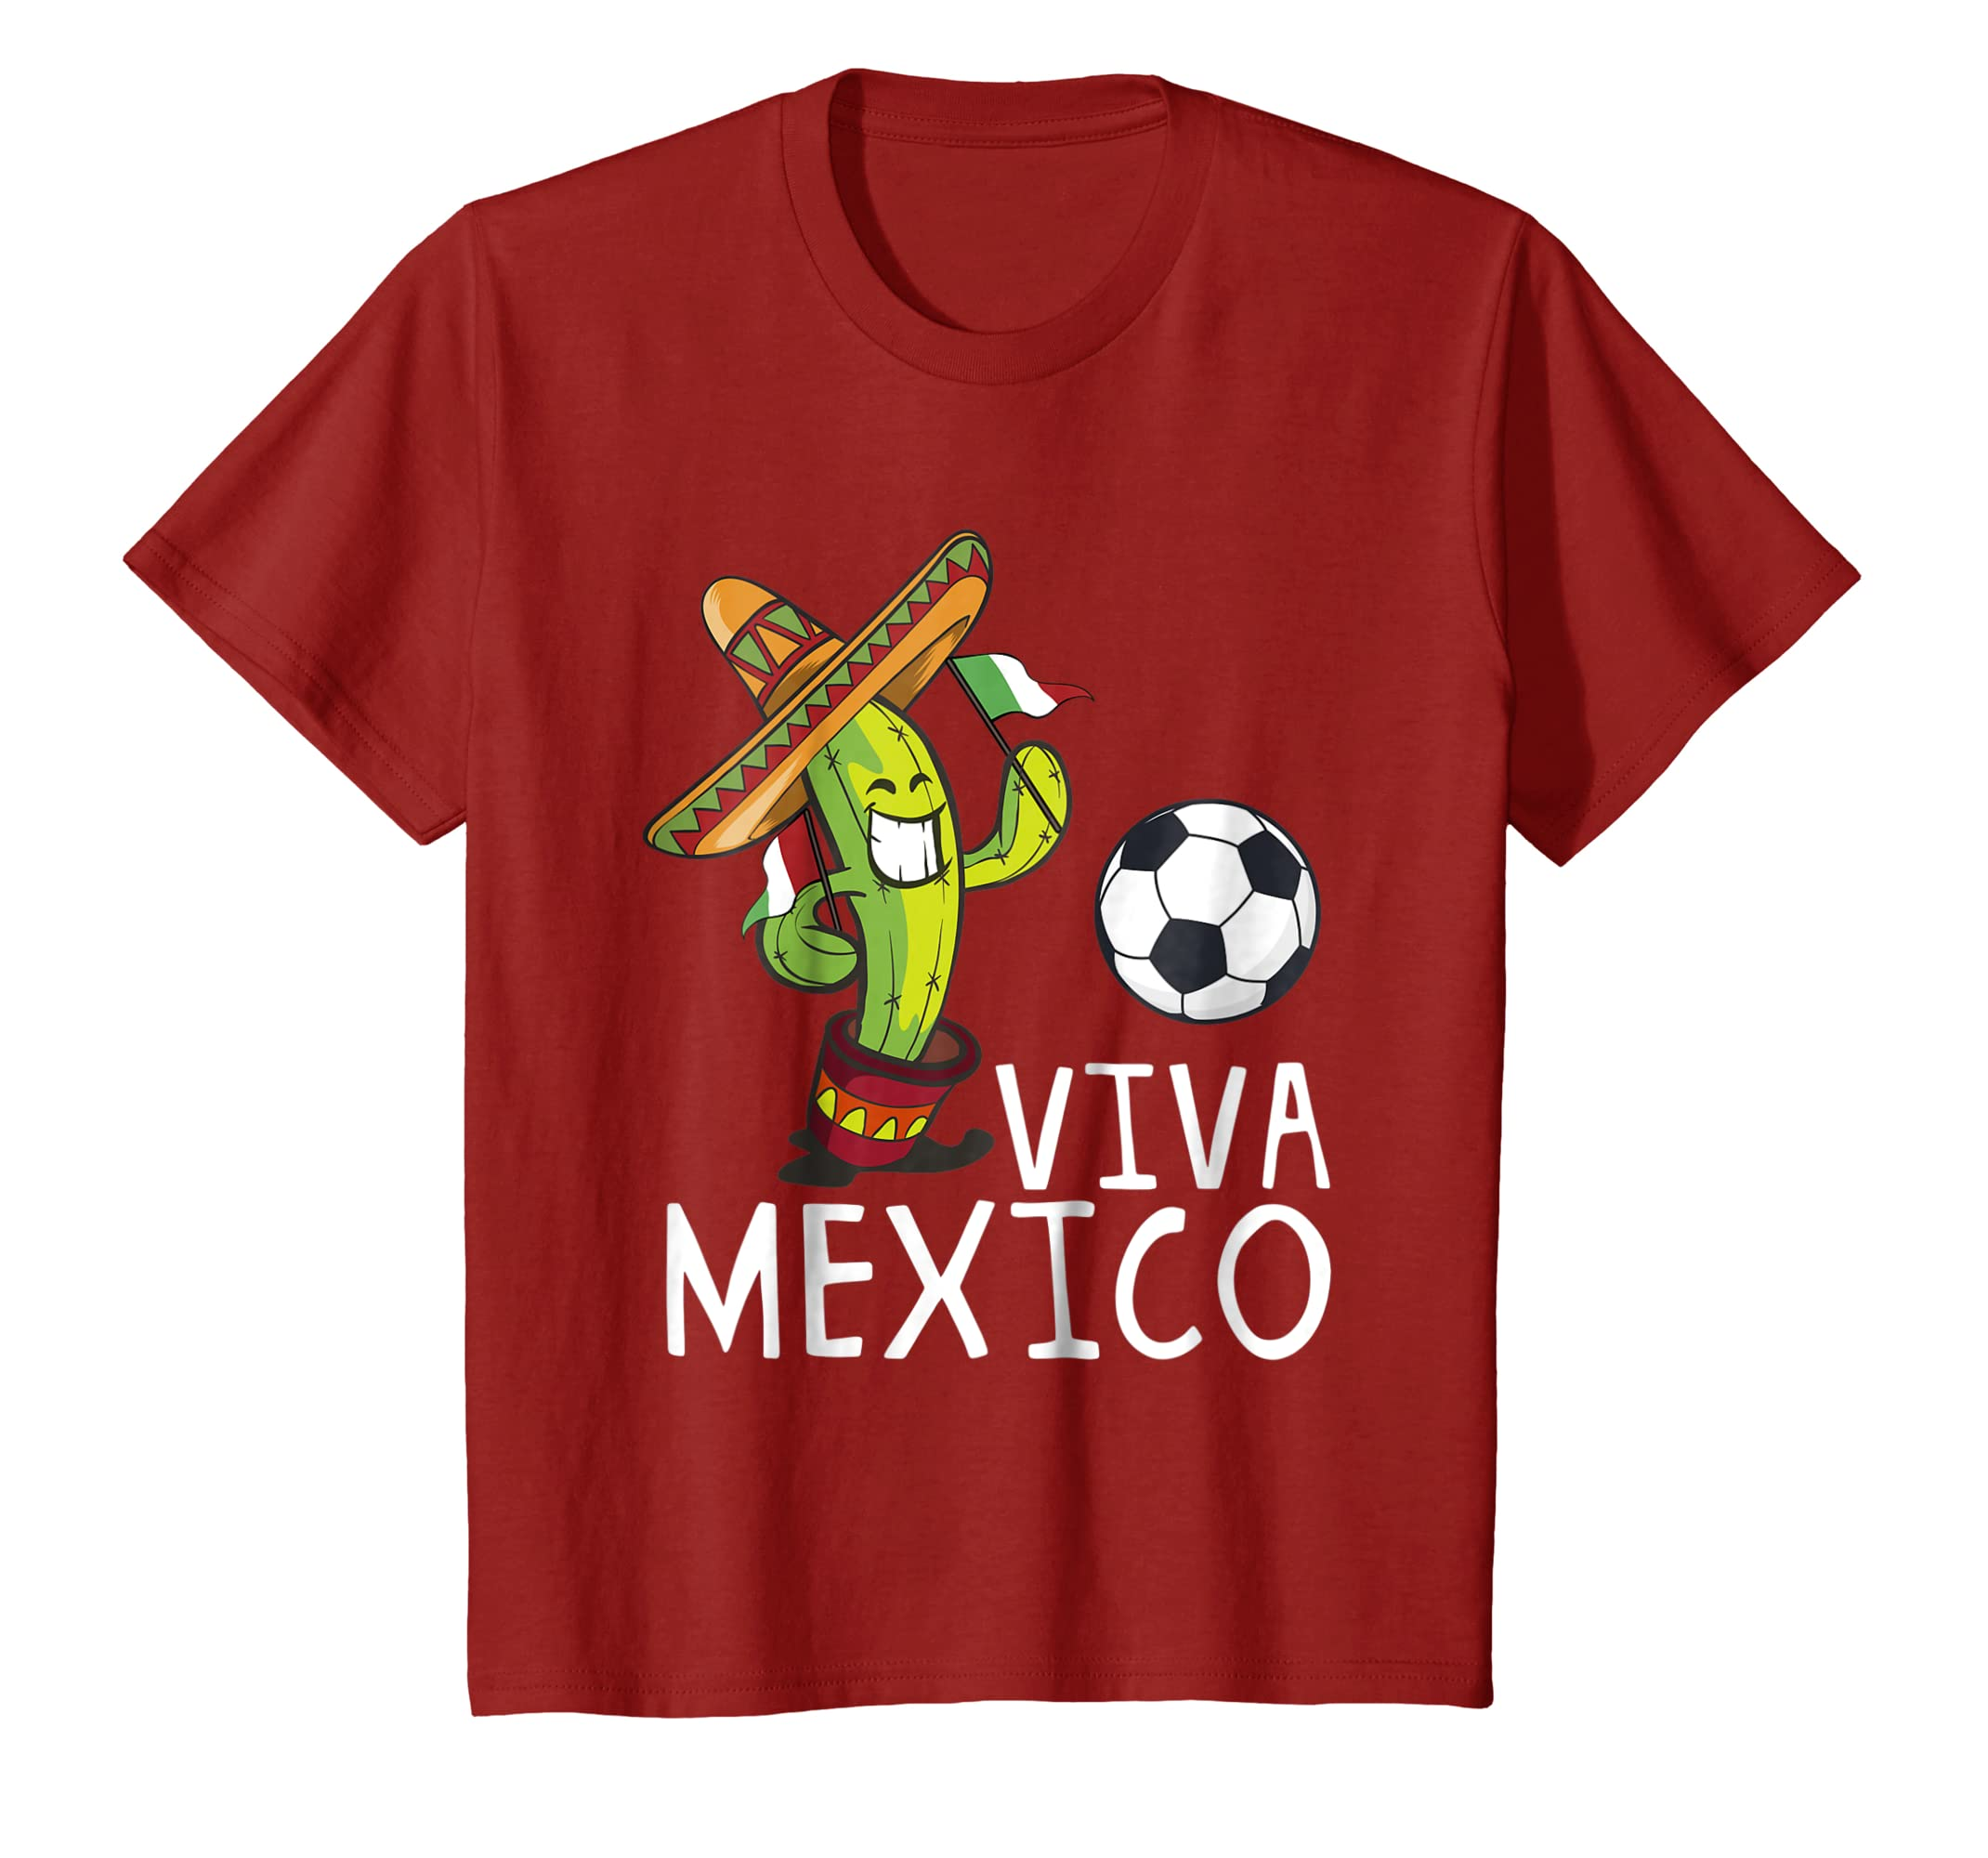 Amazon.com: Viva Mexico con cactus y balon-Mundial de Futbol camiseta: Clothing